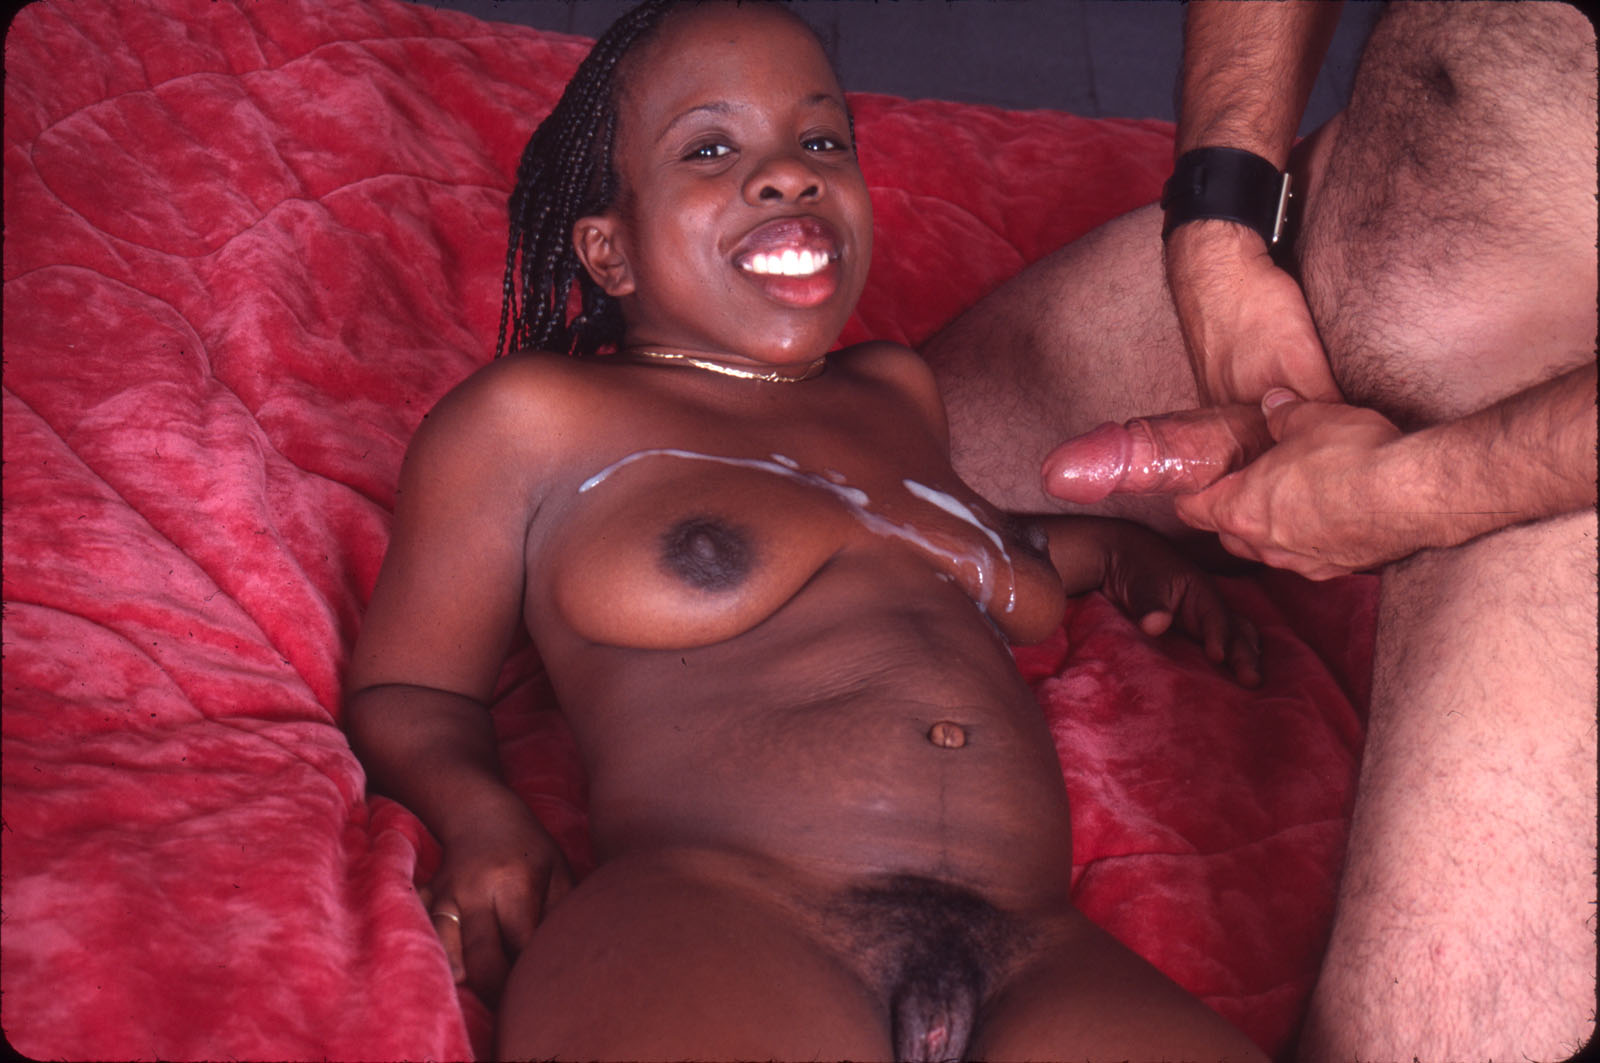 Ssbbw squashing mobile porn free sex videos hot adult XXX